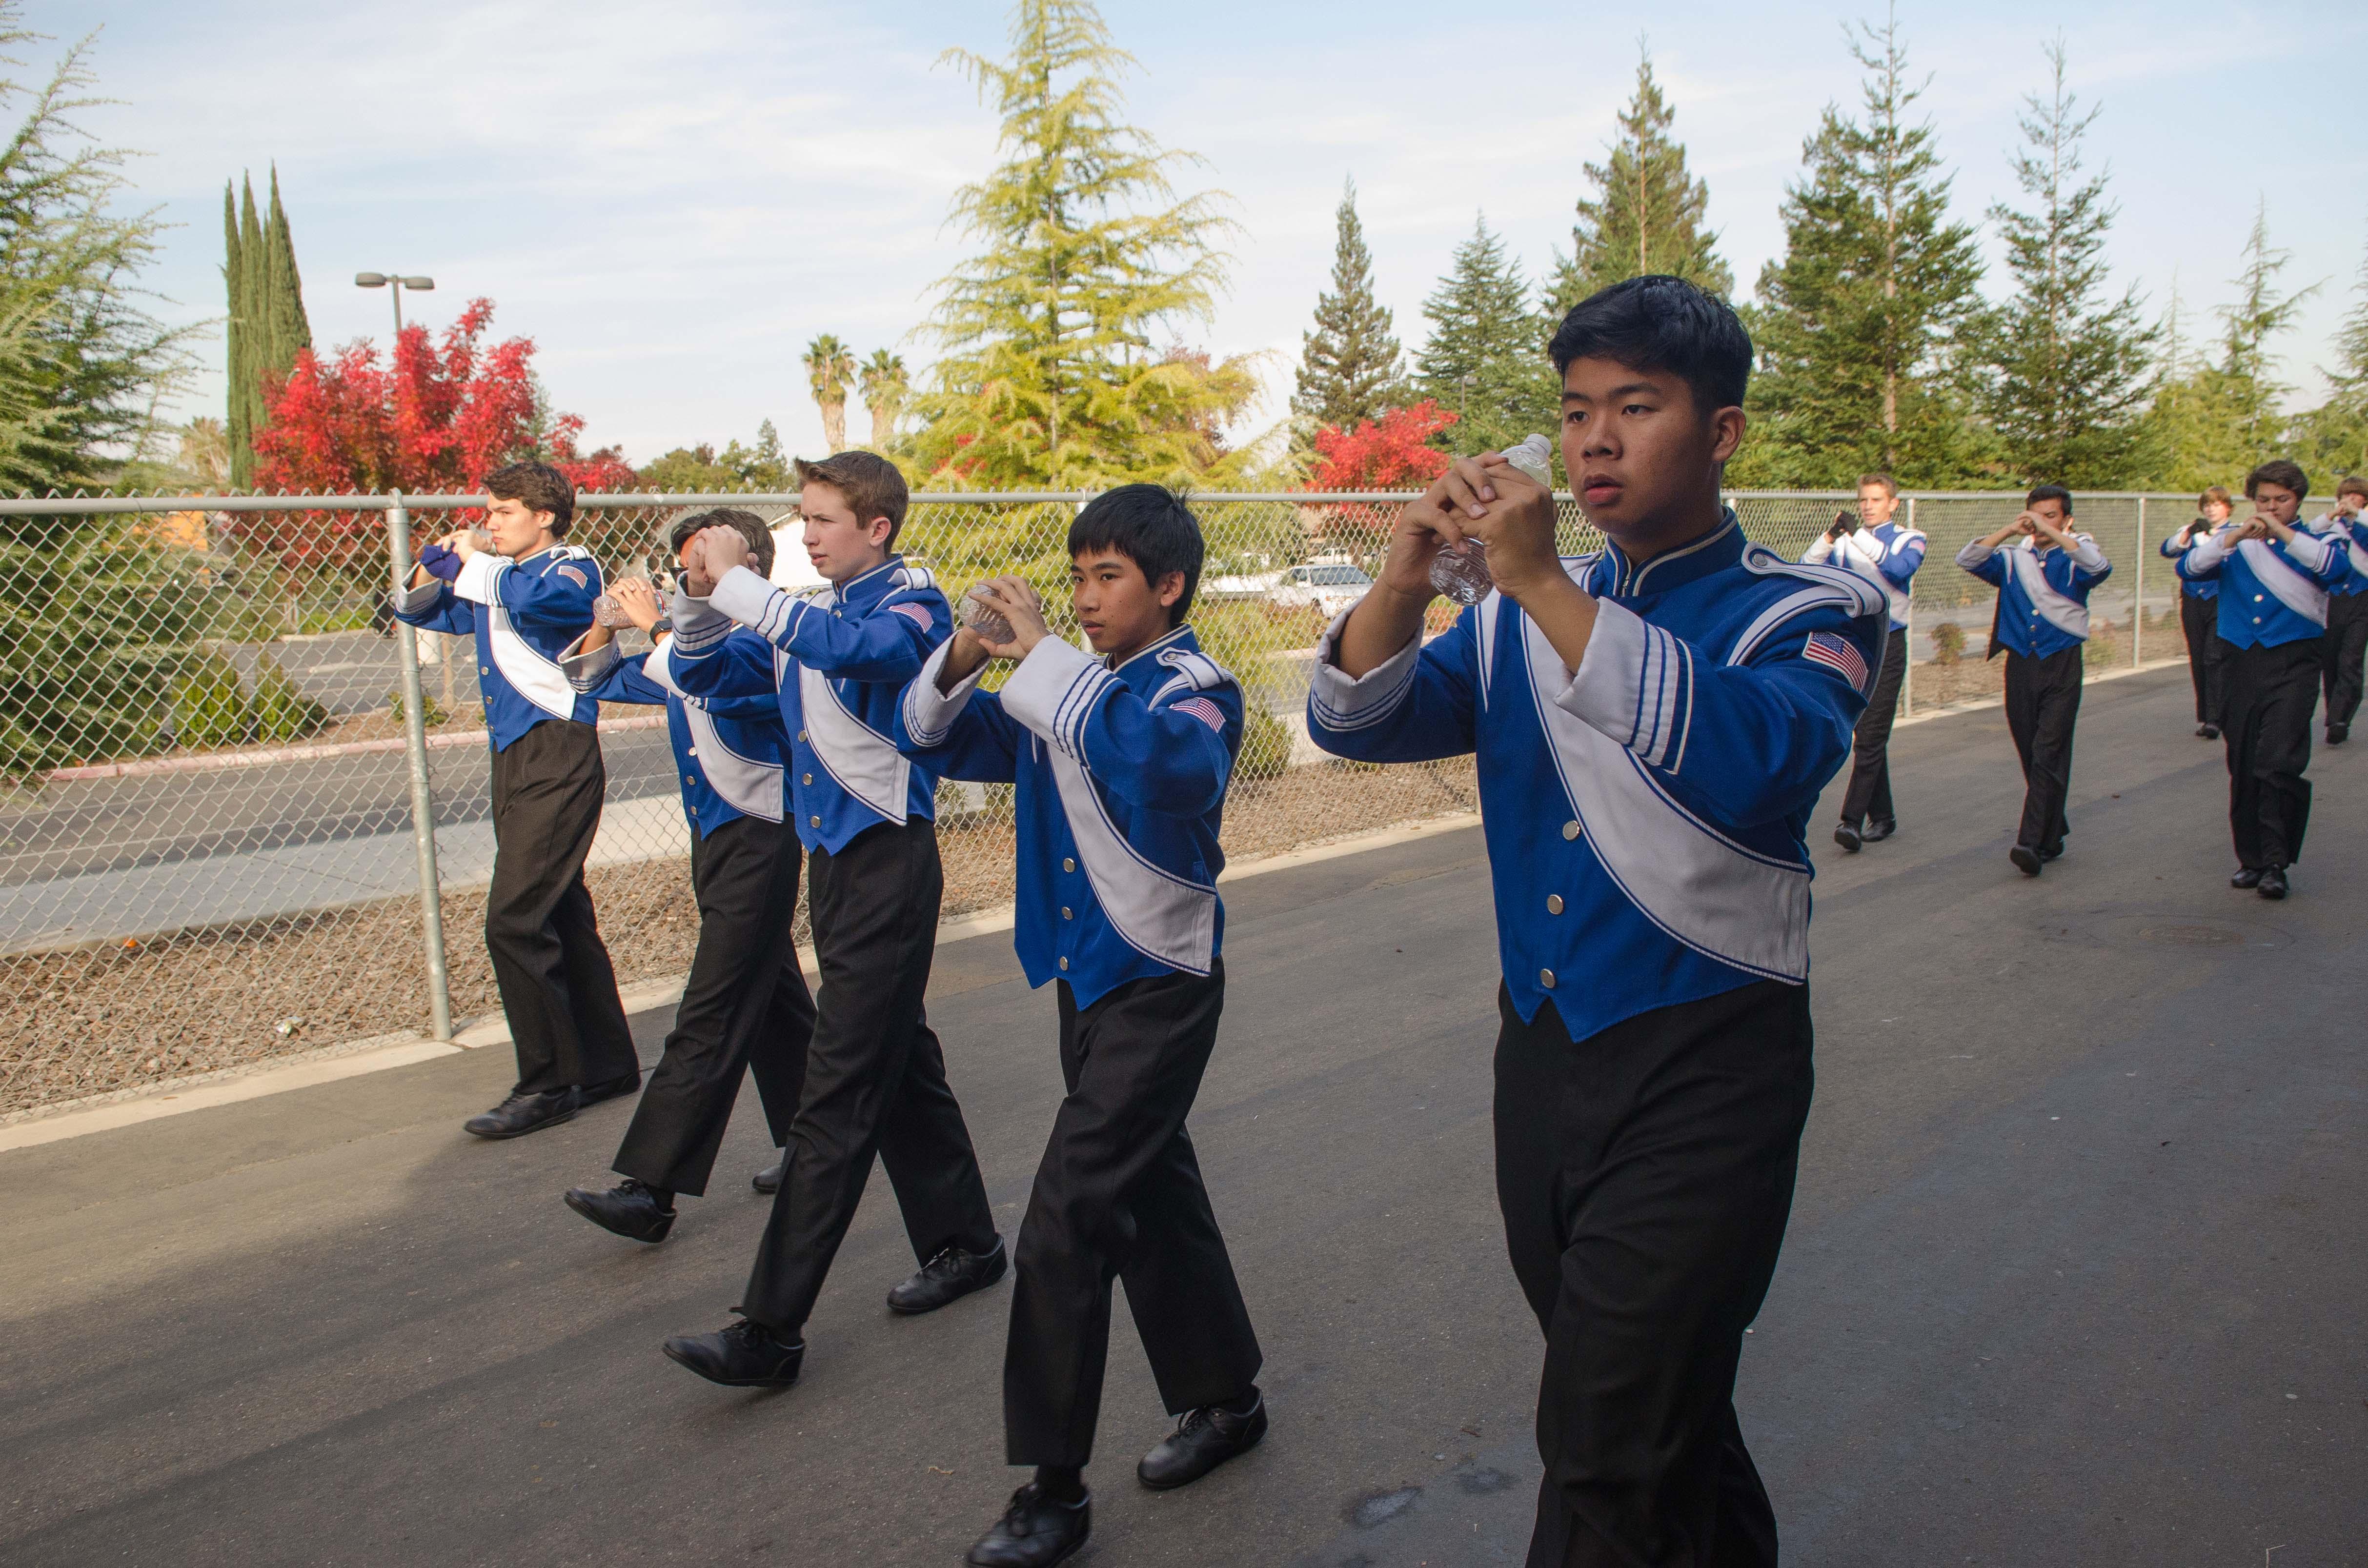 Lodi Band Comp 11-5-16